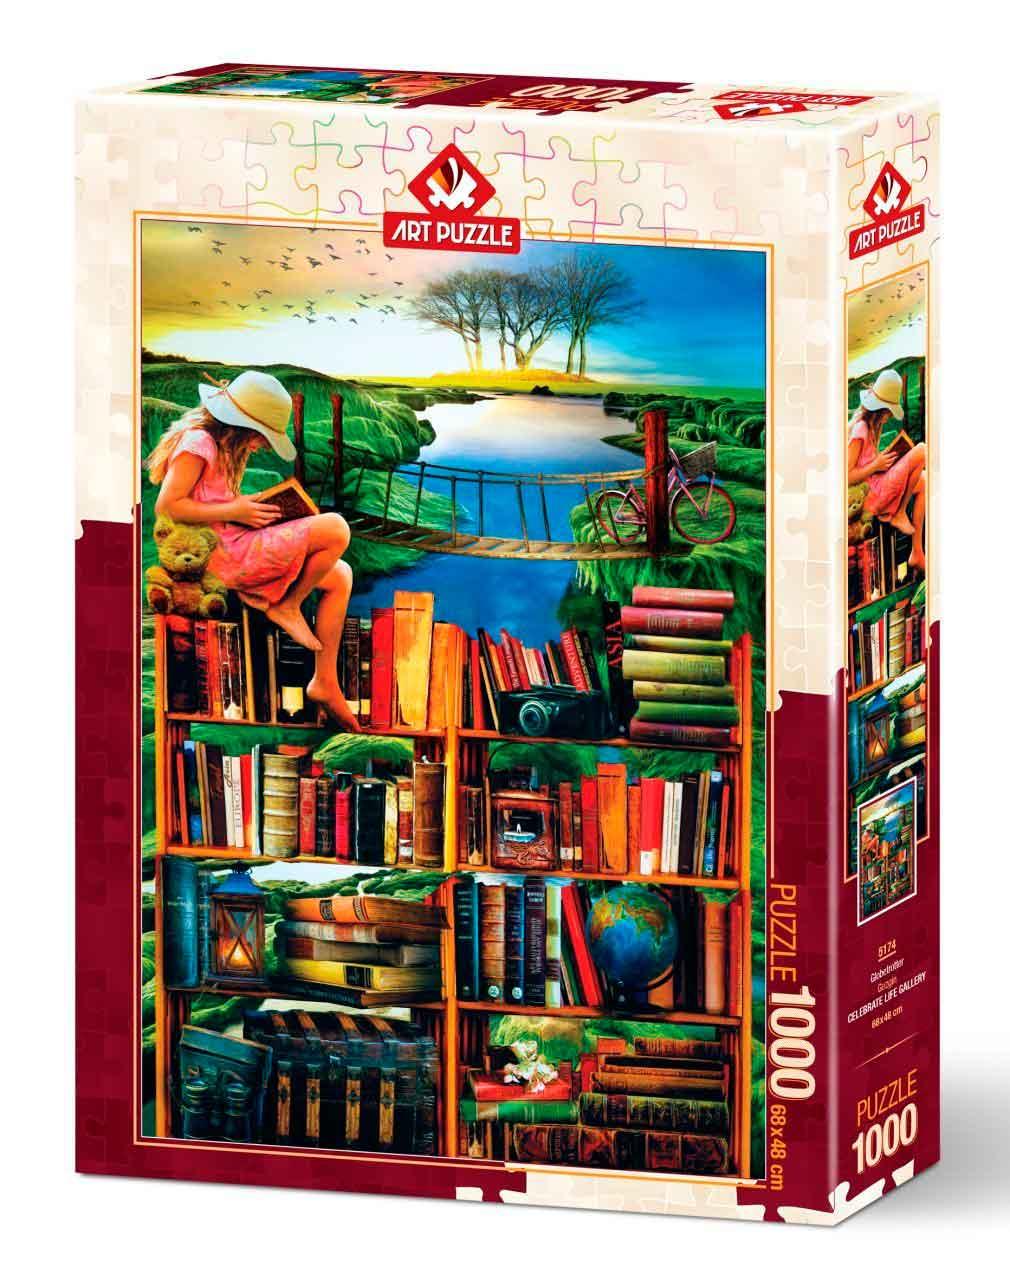 Puzzle Art Puzzle Trotamundos de 1000 Piezas